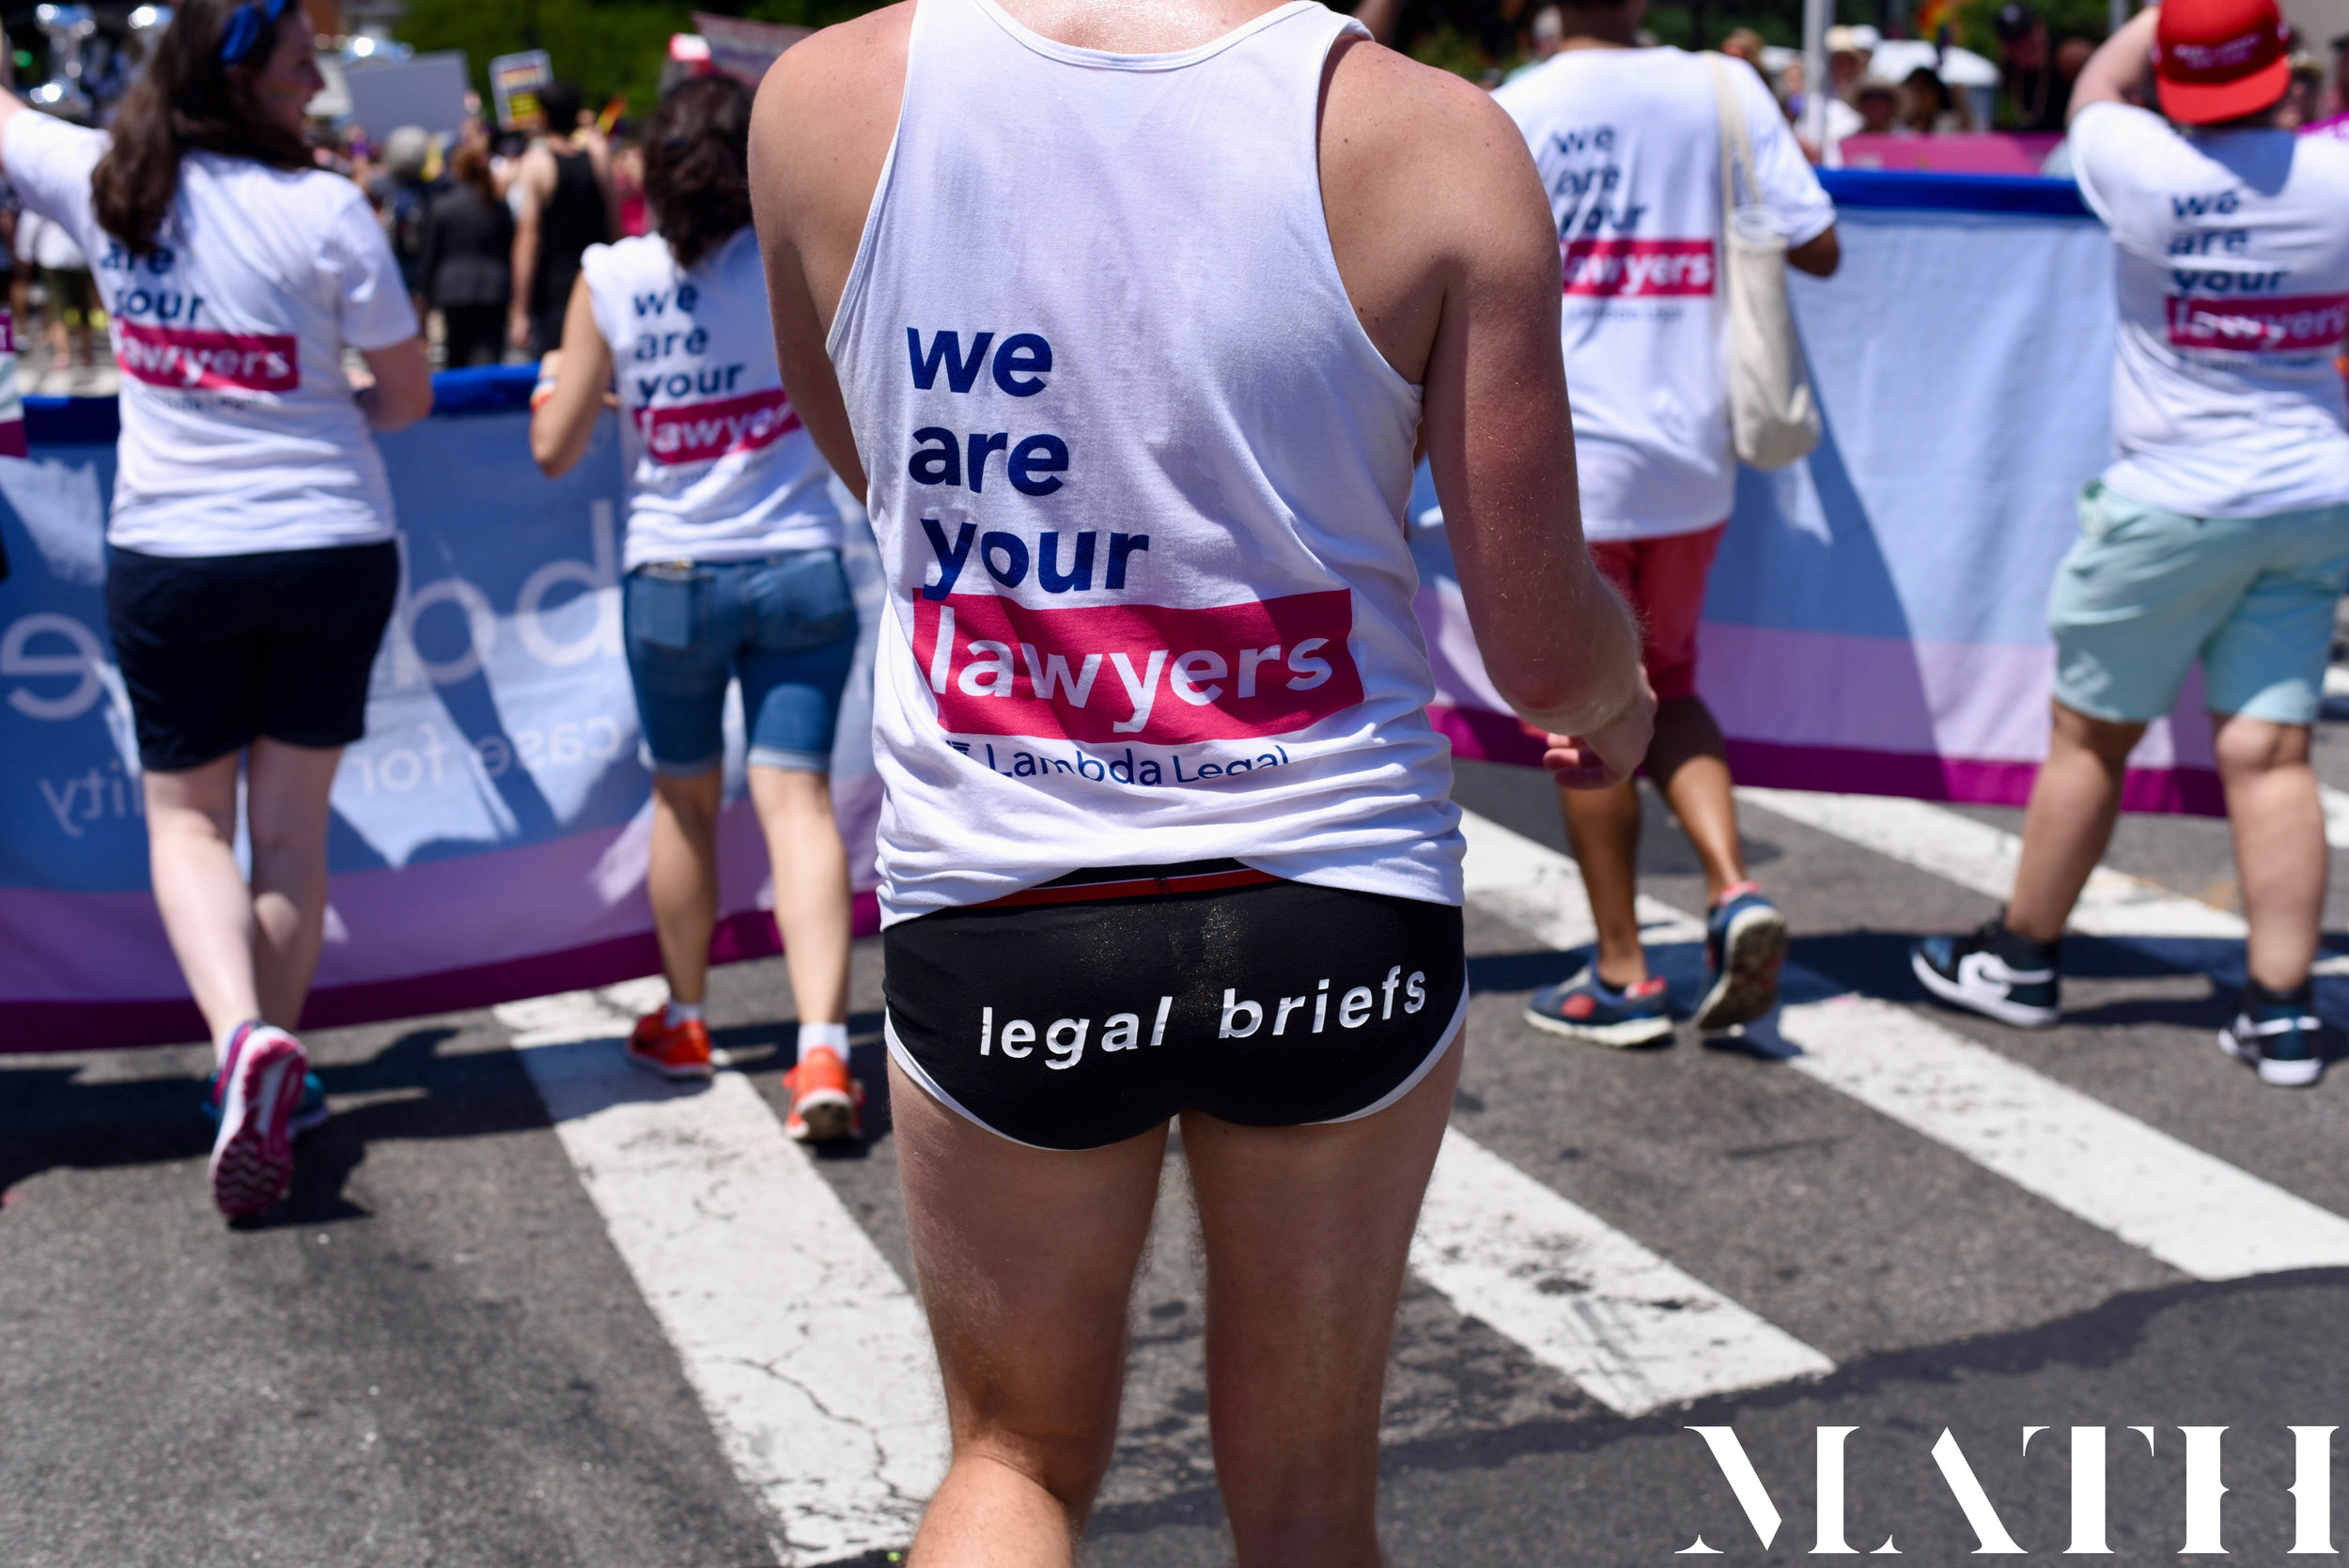 NYC Pride_Ginger Hollander 8.jpg